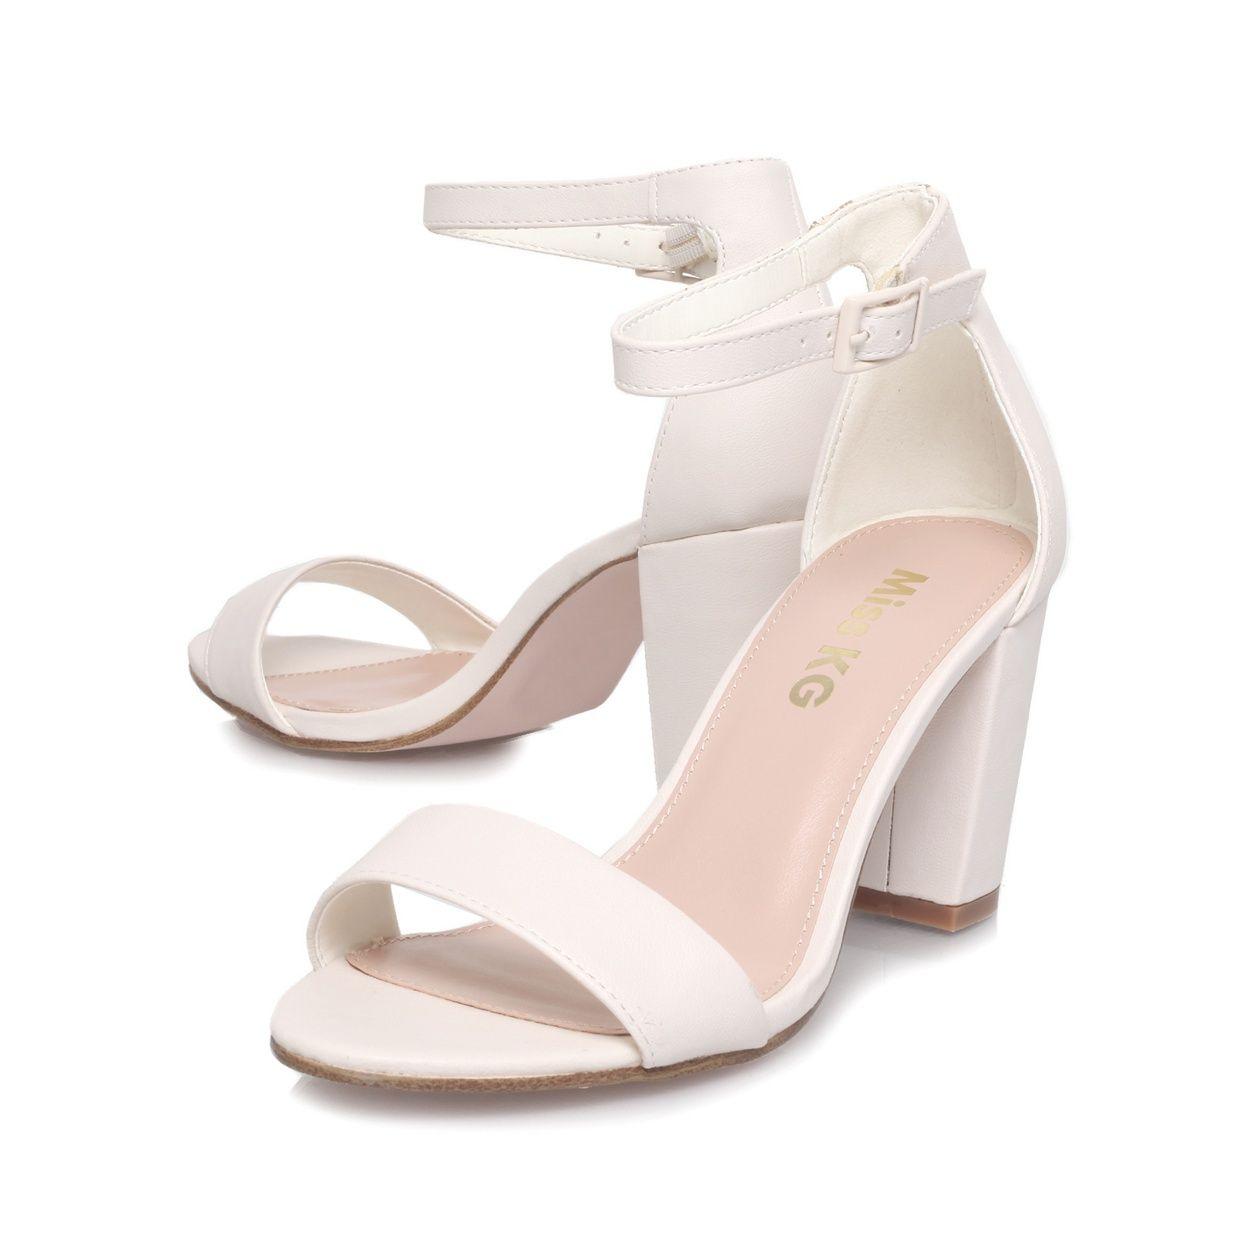 Miss KG White 'Paige' mid heel sandals